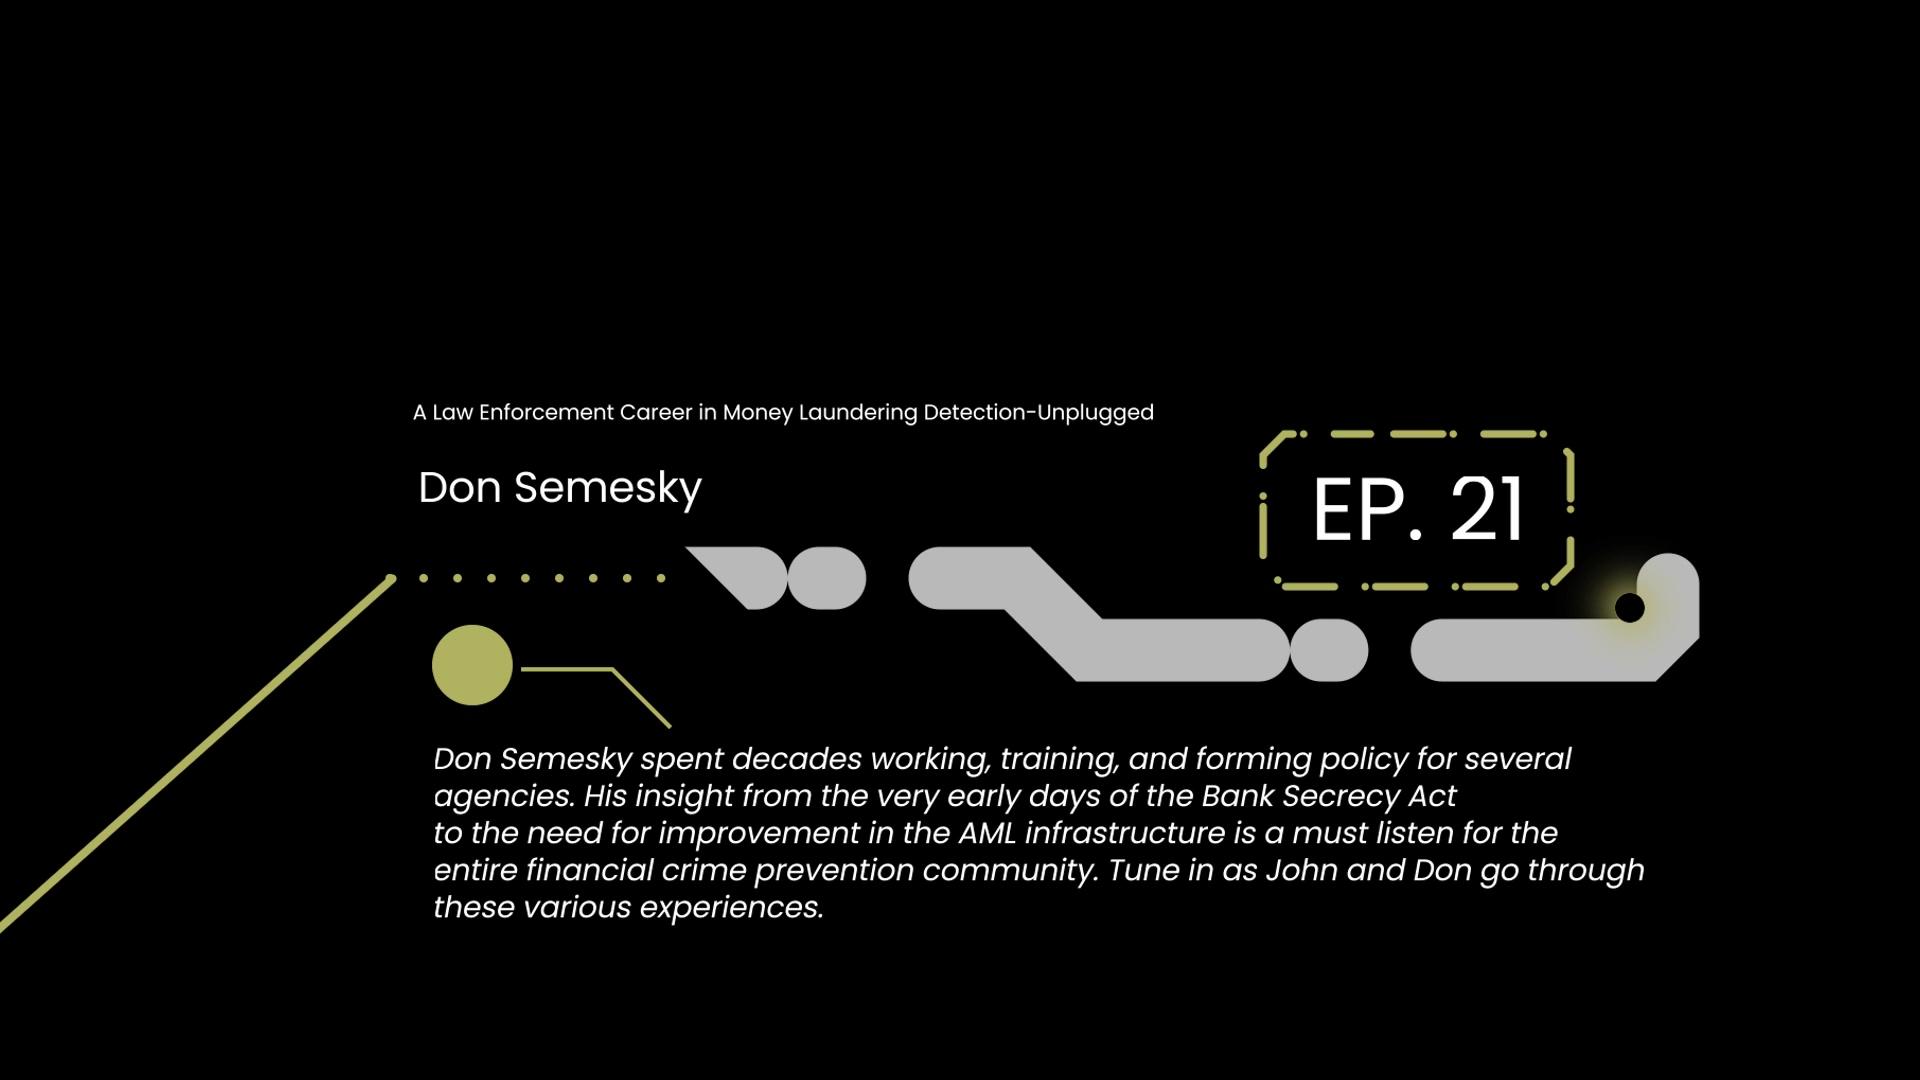 Don Semesky